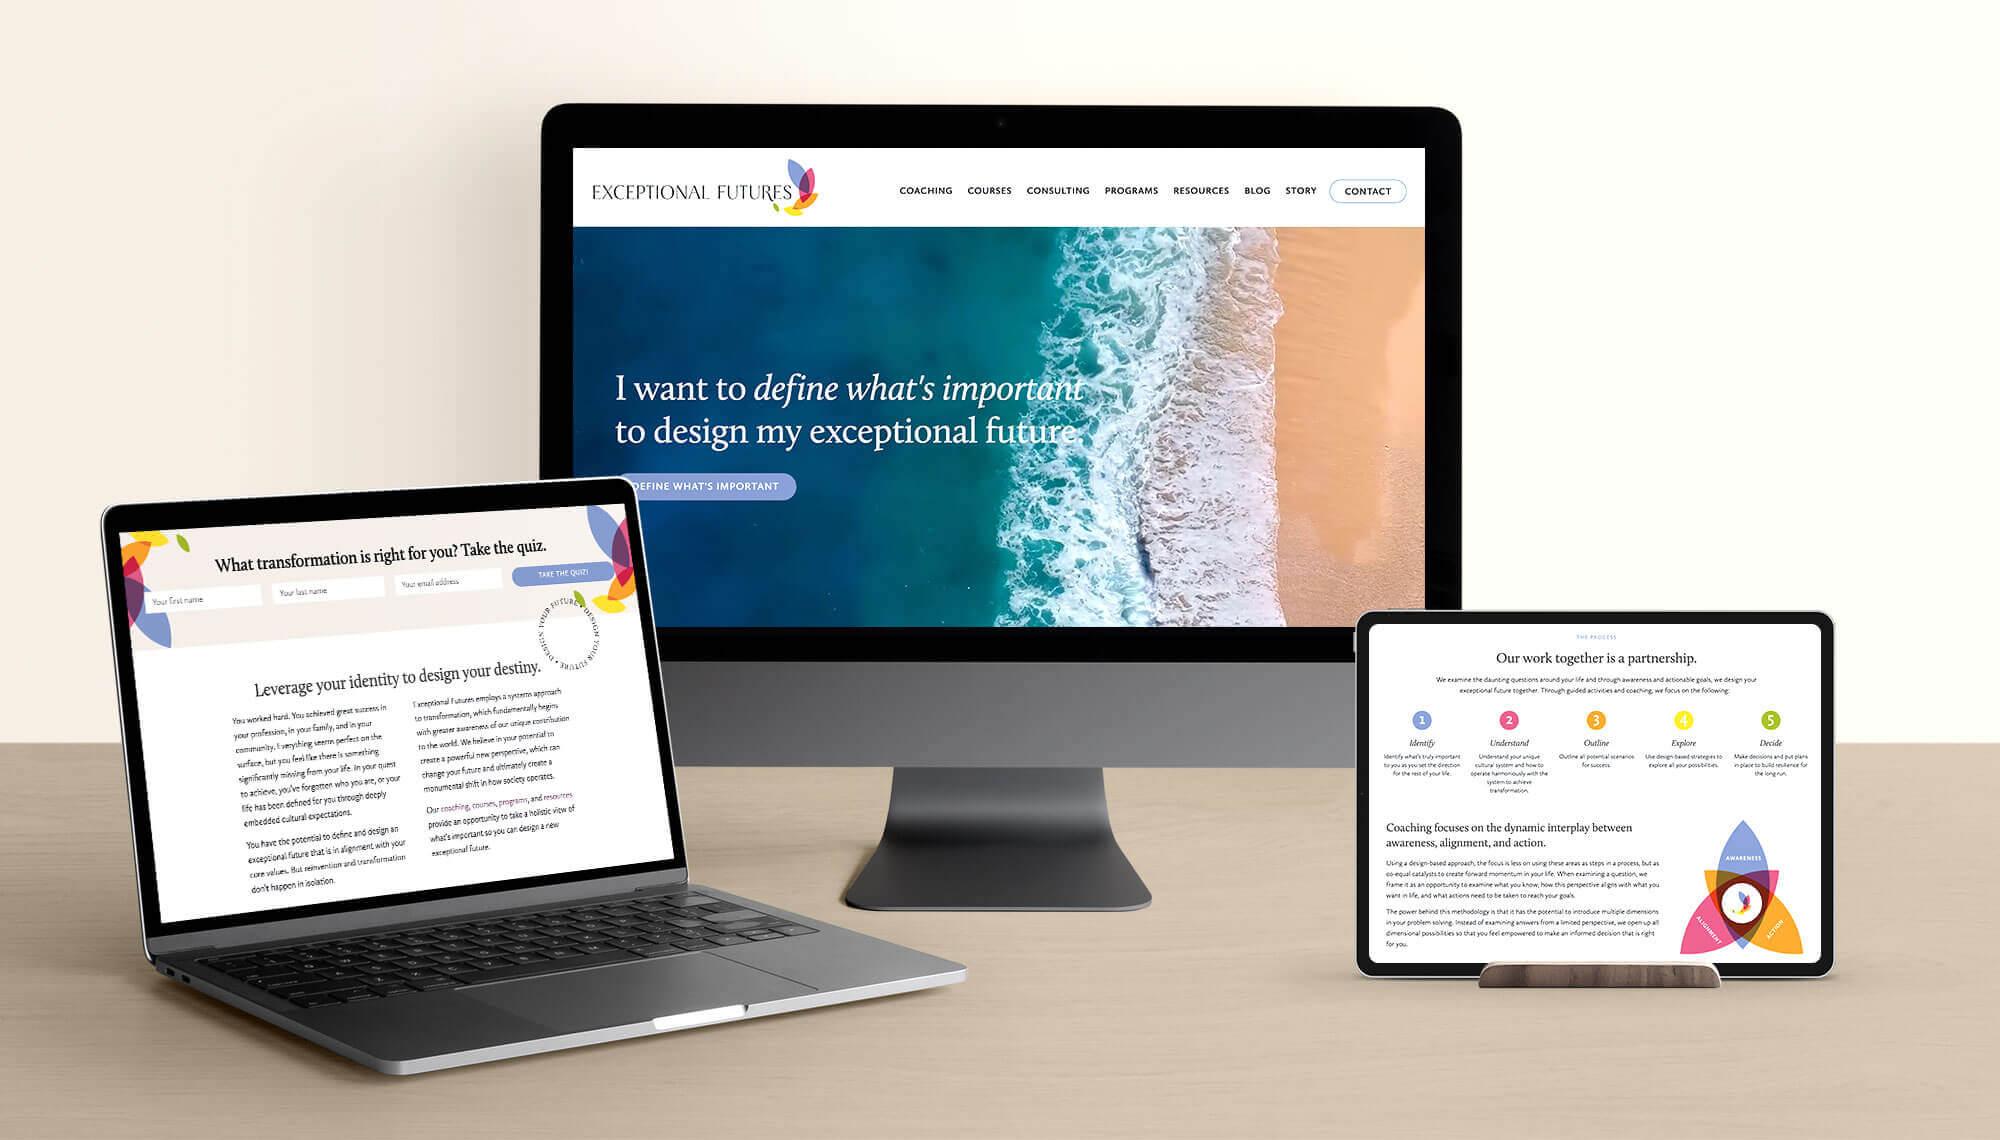 Exceptional Futures Website Design and Branding